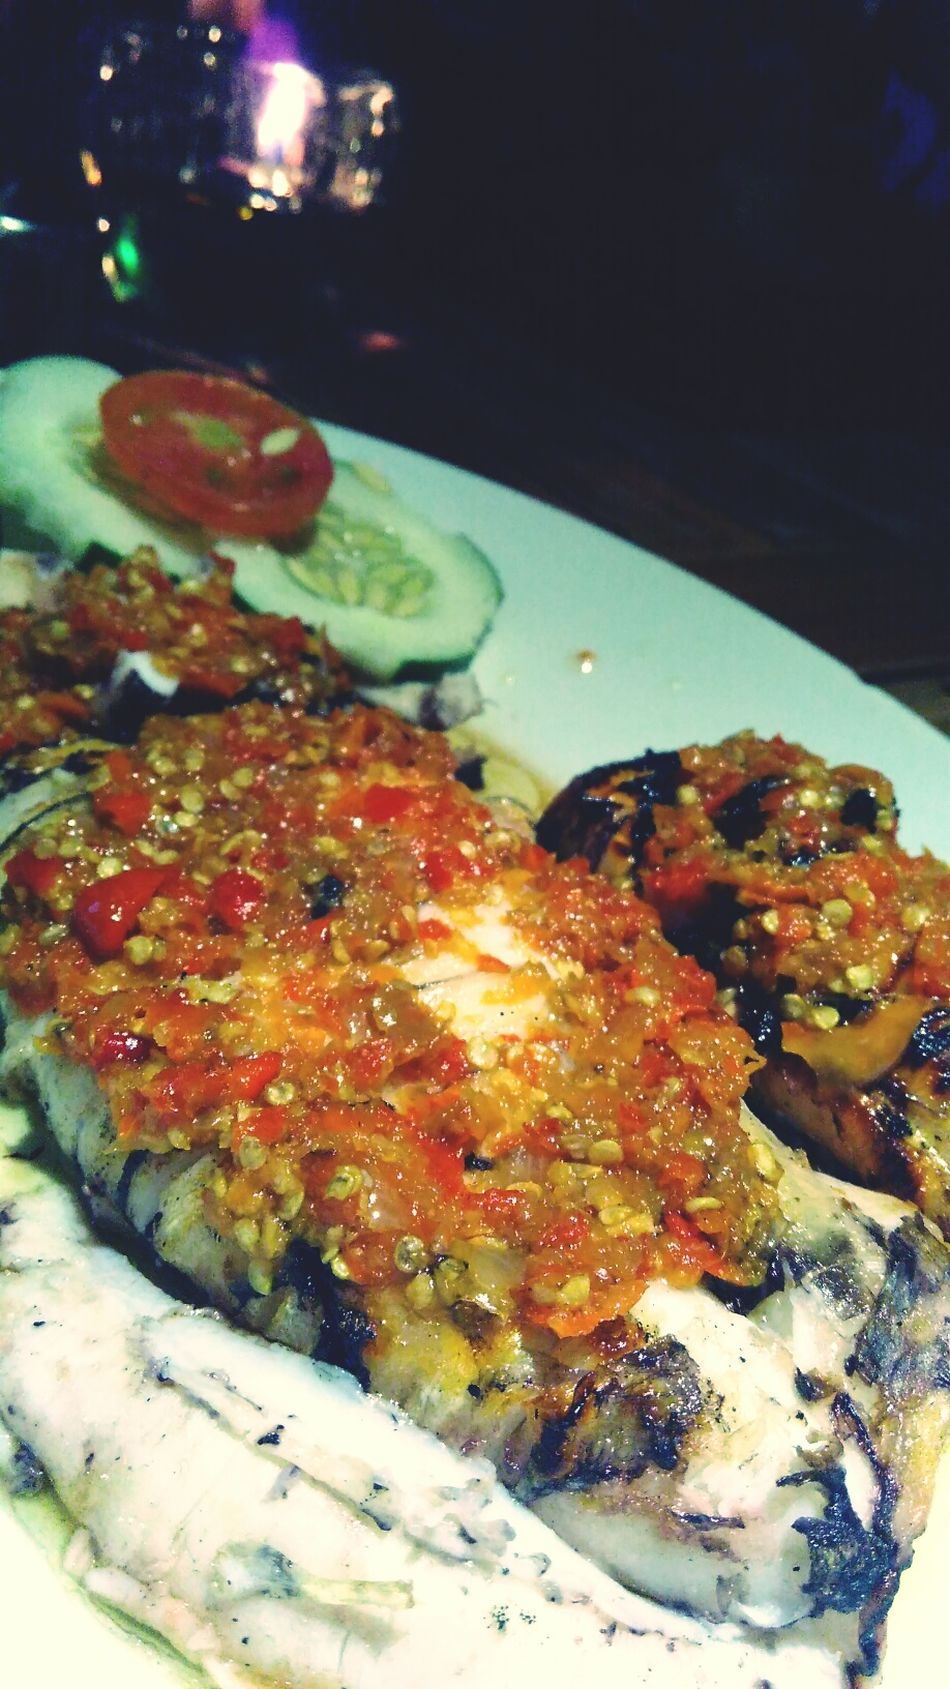 Dinner Indonesianculinary Wonderful Indonesia Northsulawesi Cumi Bakar Rica Food